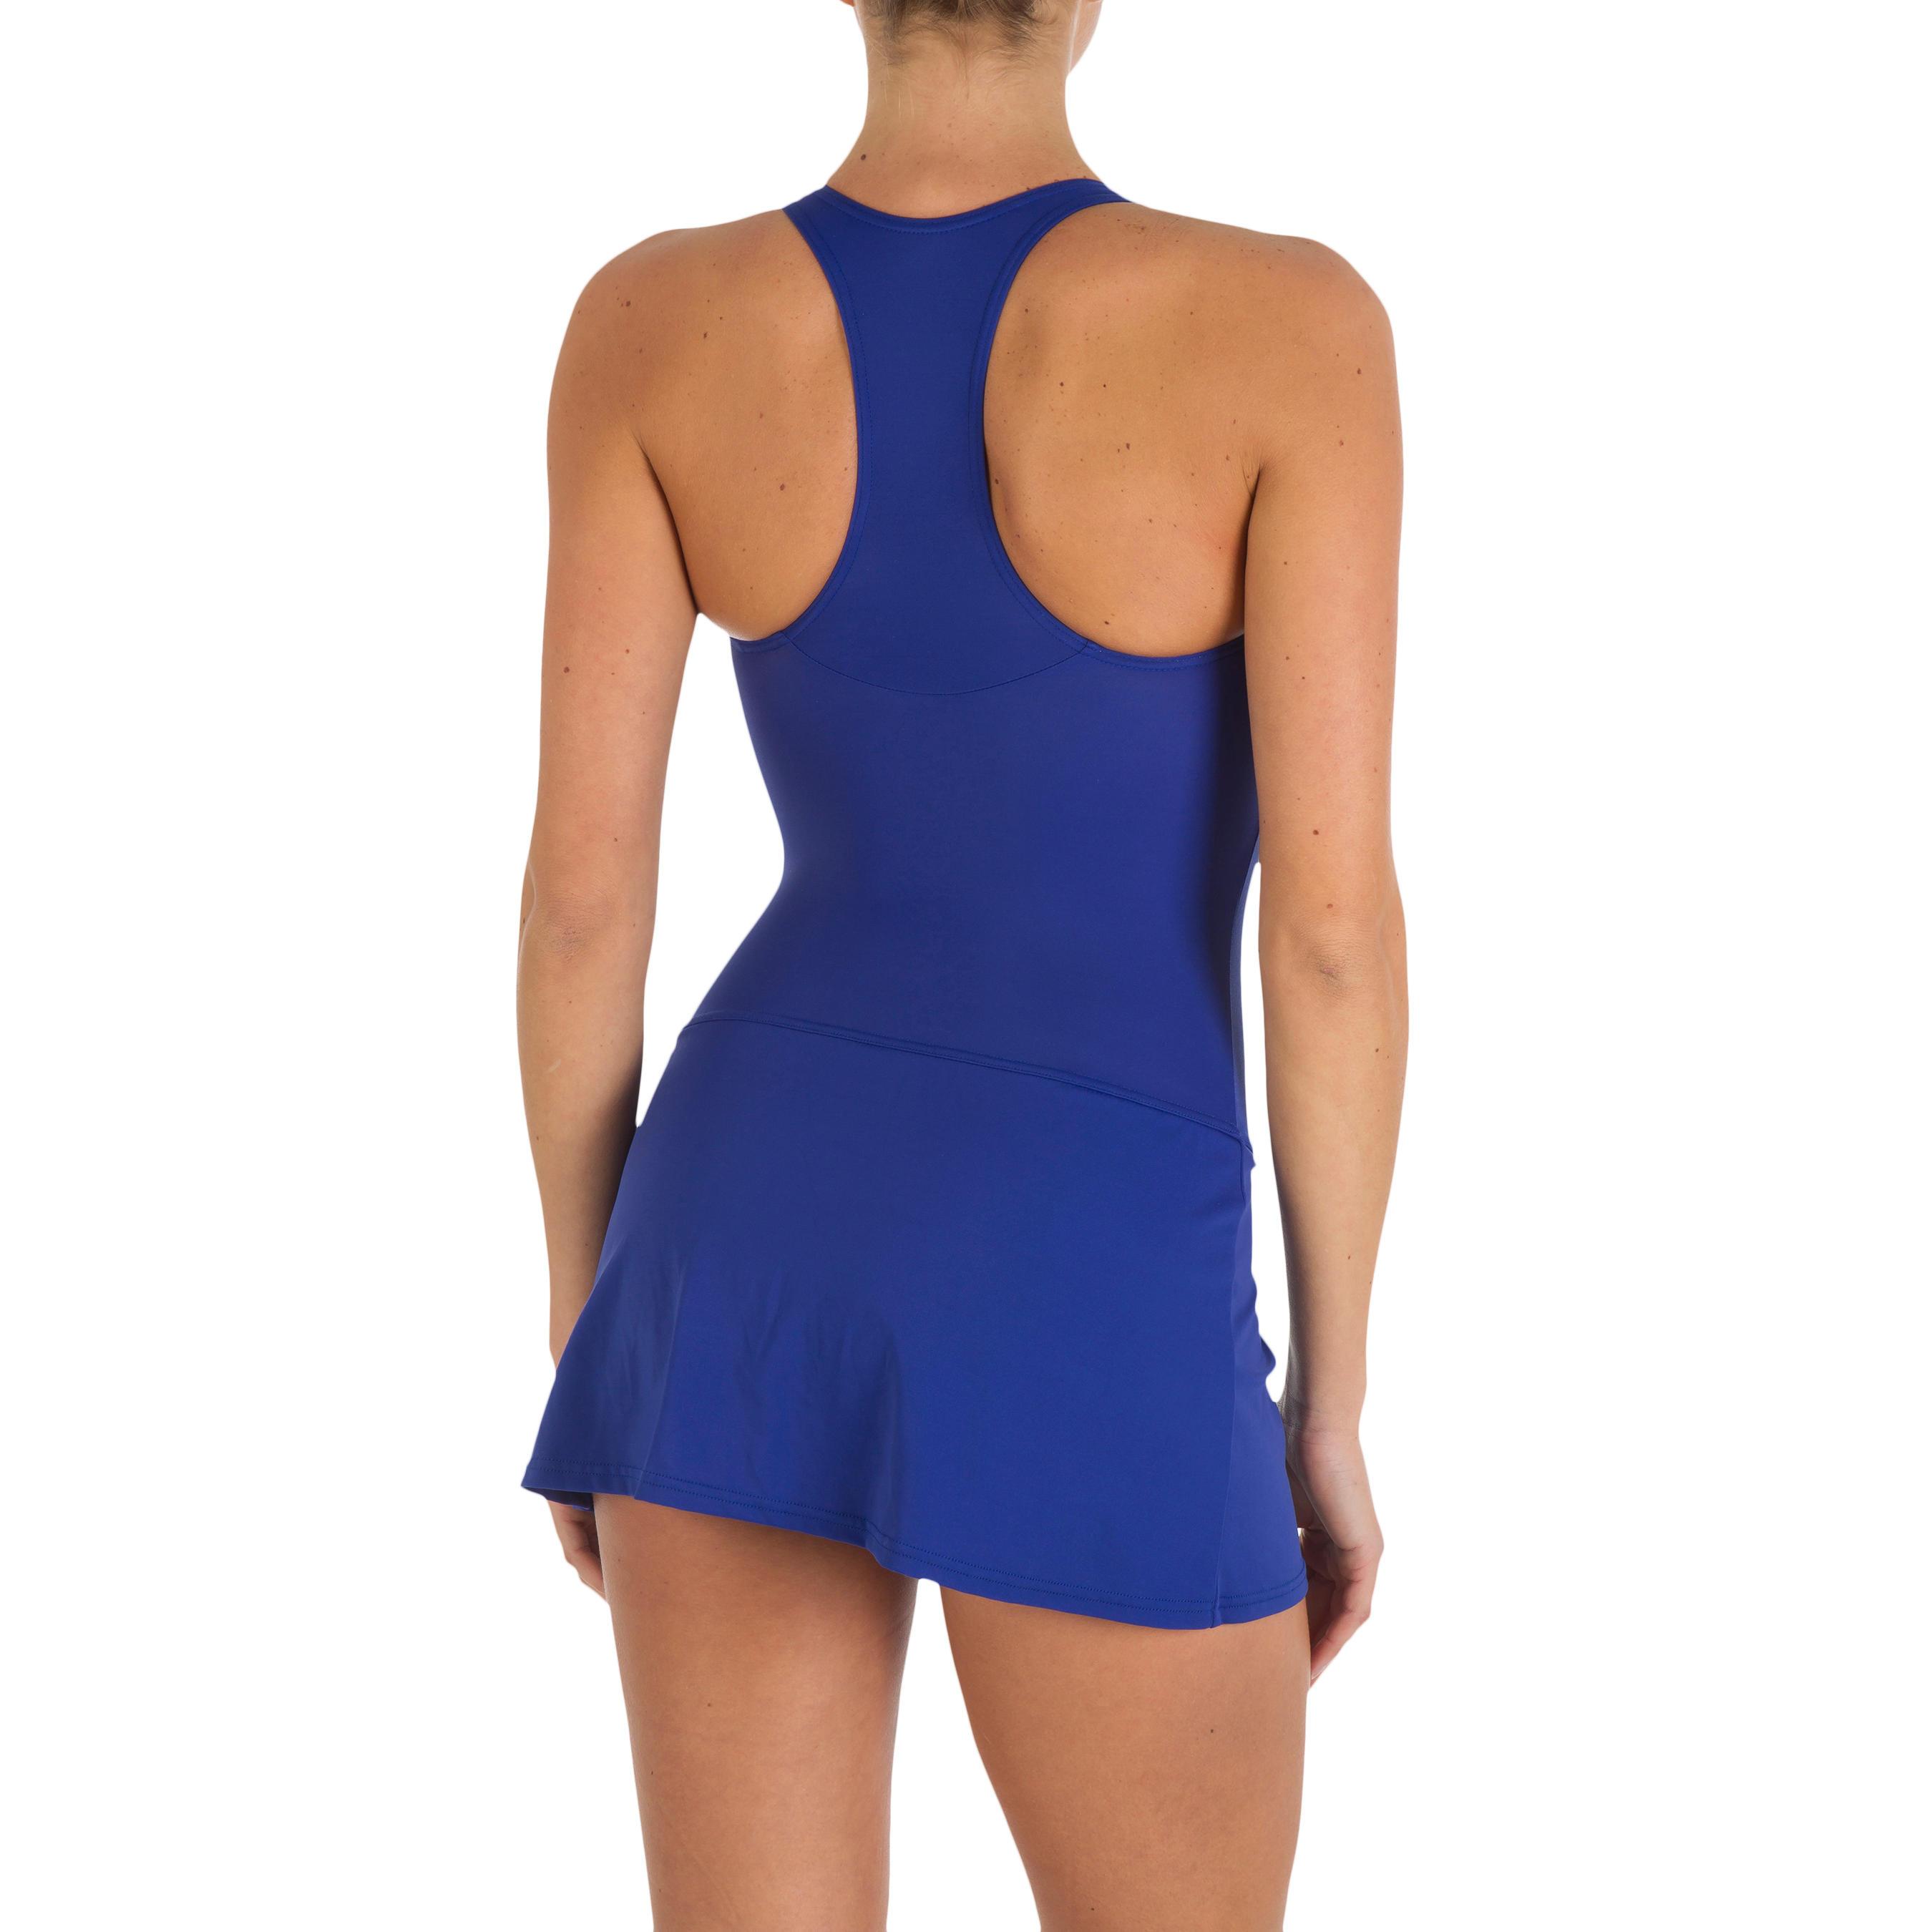 Women Swimming Costume Leony Skirt - Blue